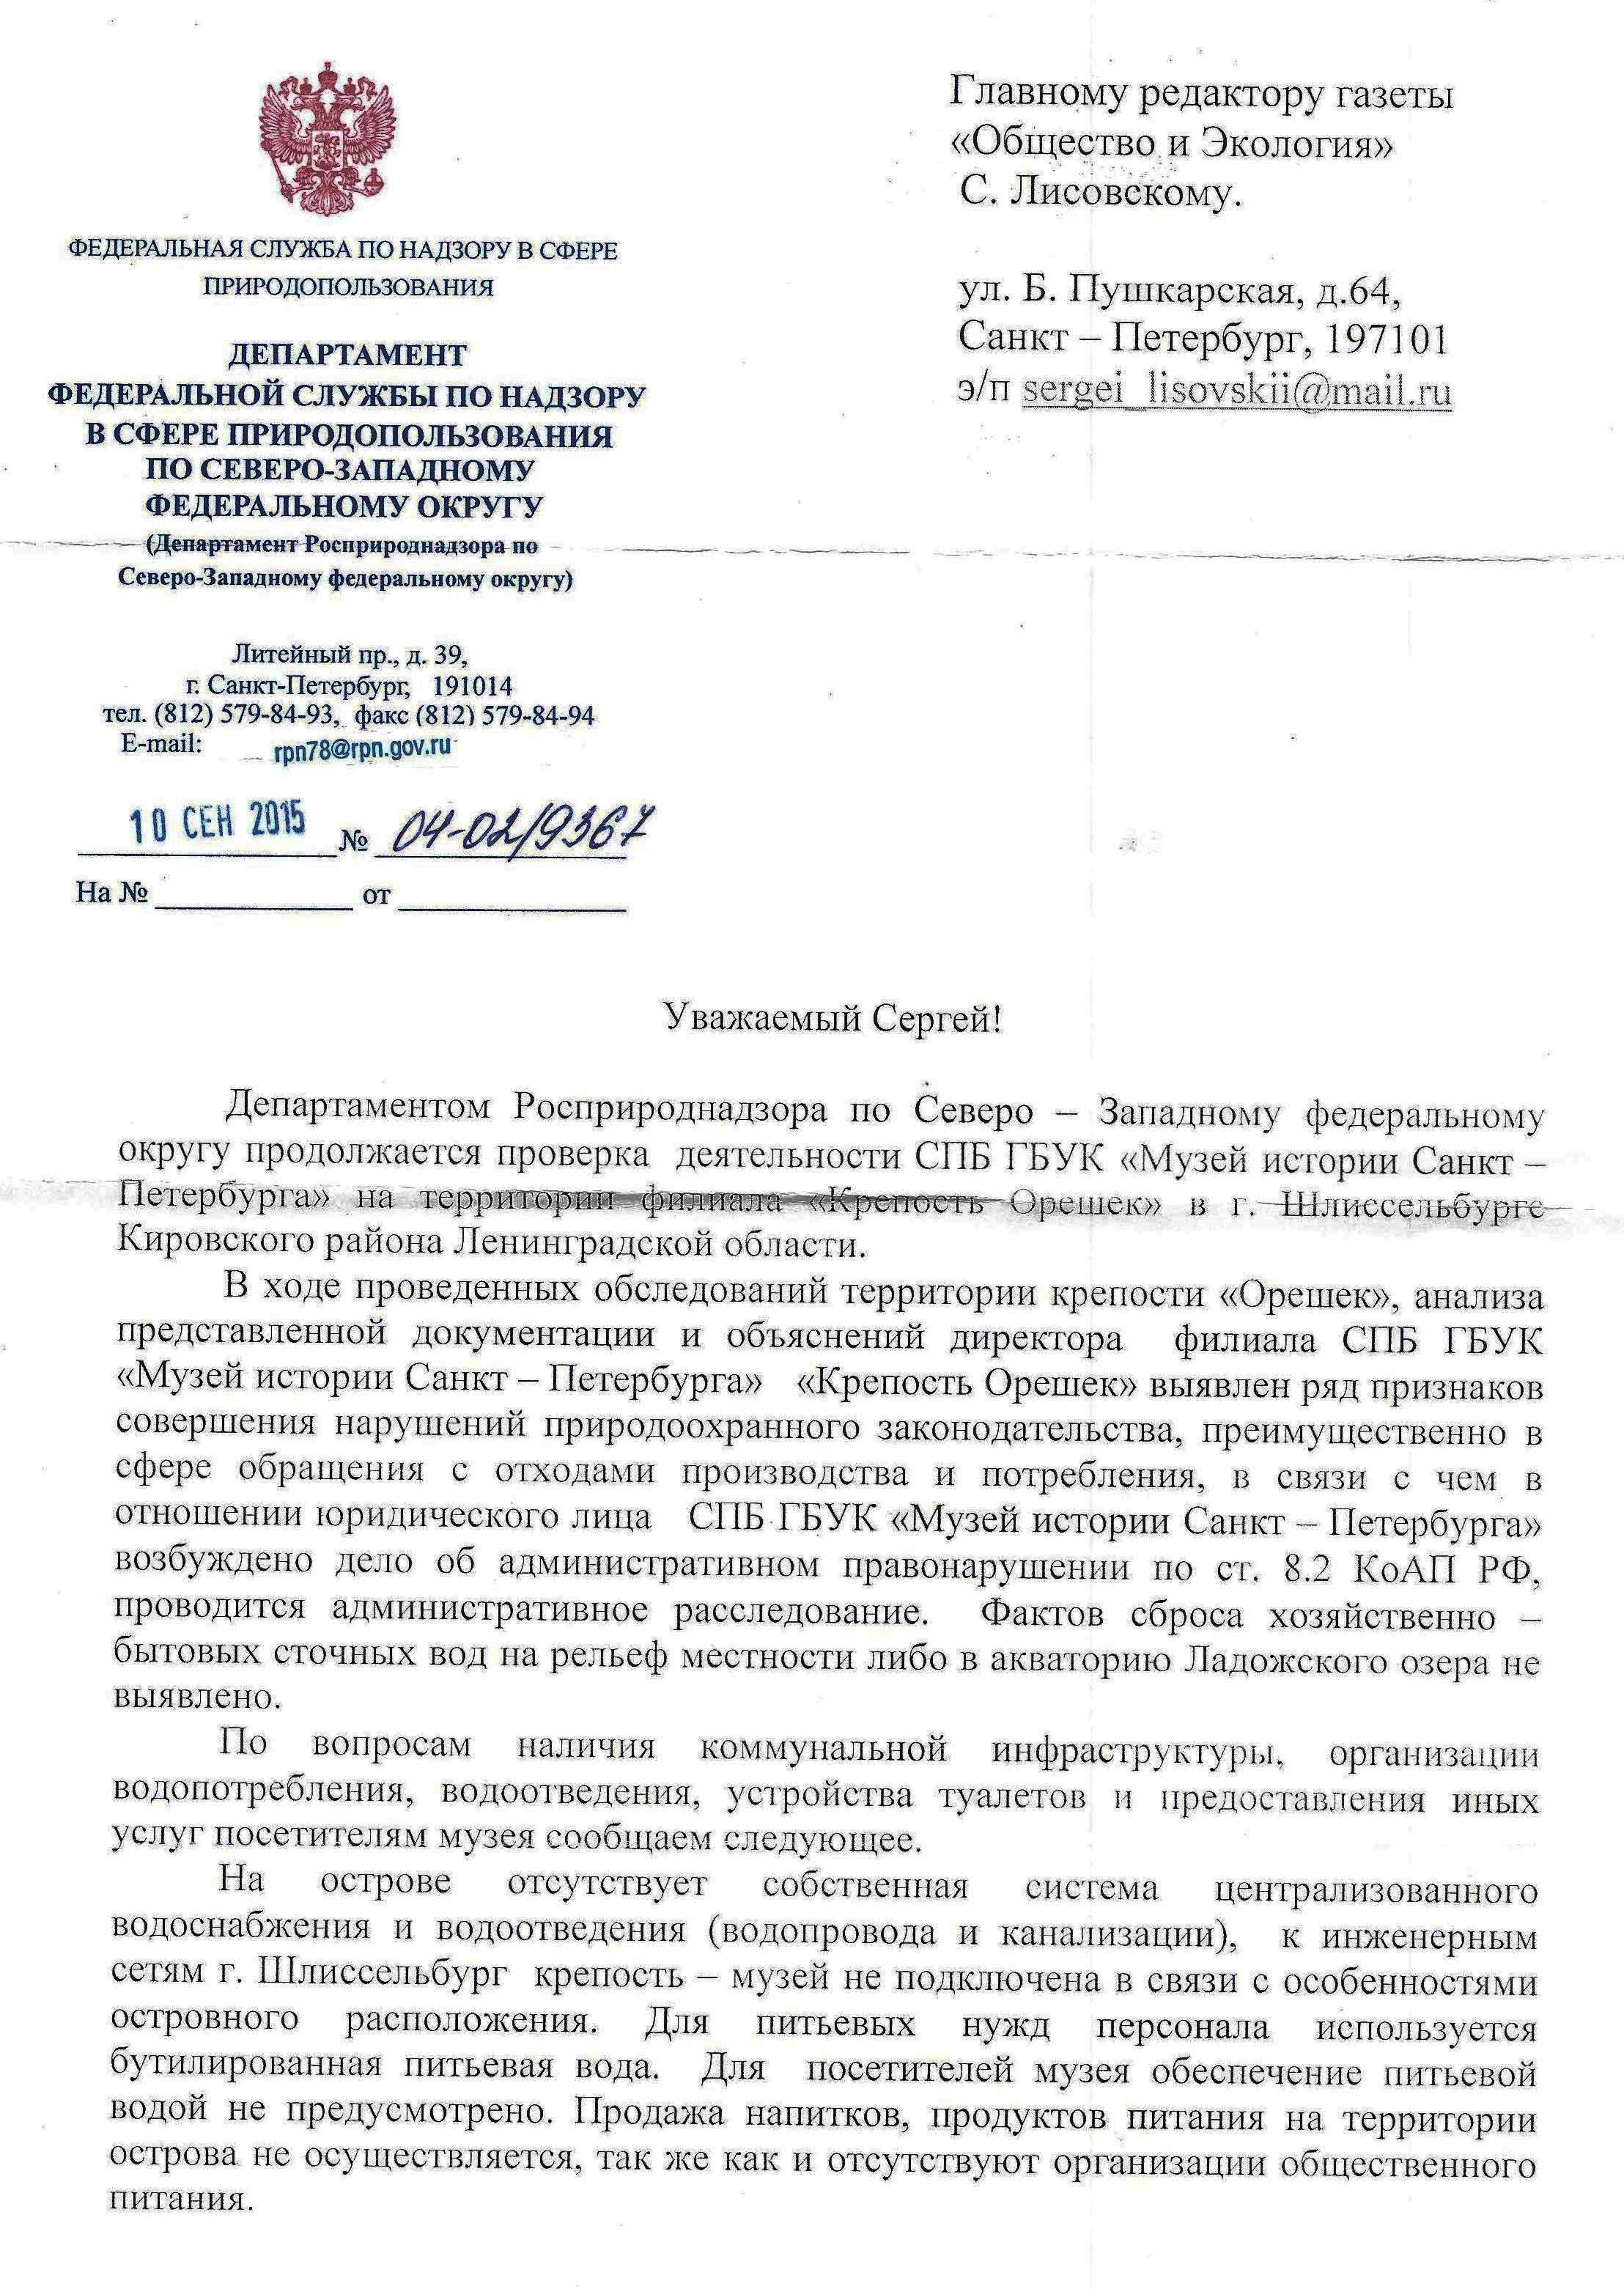 Oreshek Rosprirod Otvet 10 sent 2015 1